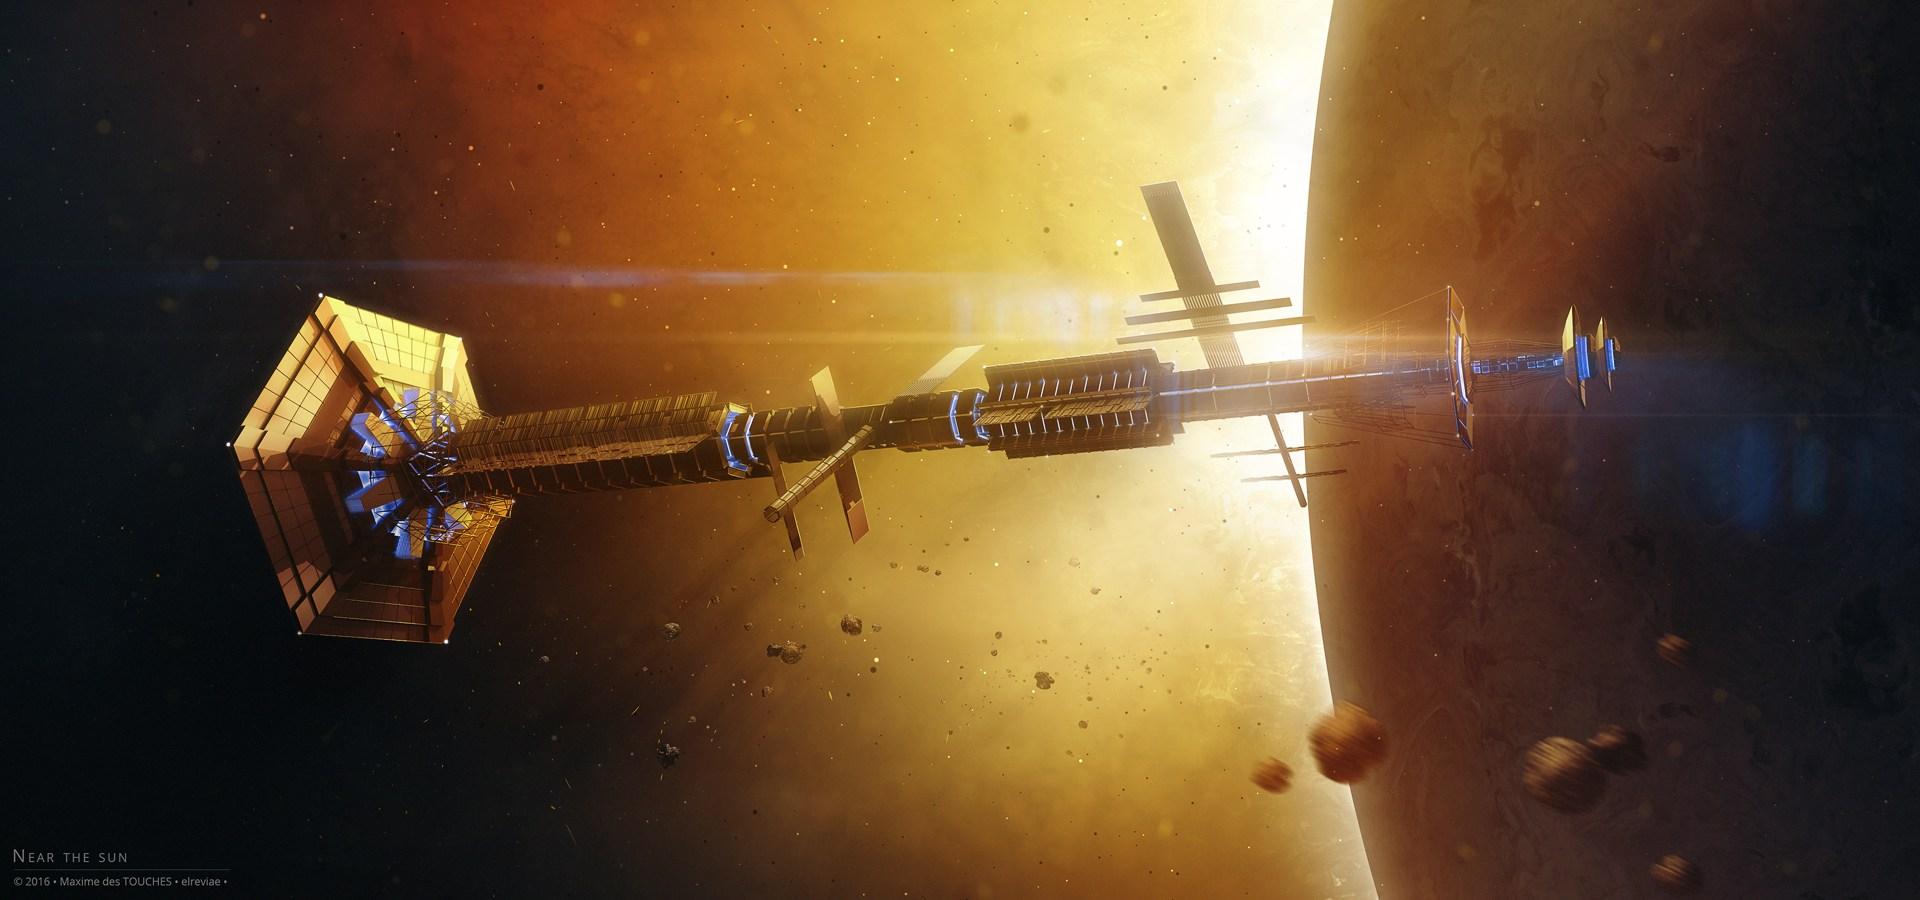 Near the Sun space art Science fiction artworks